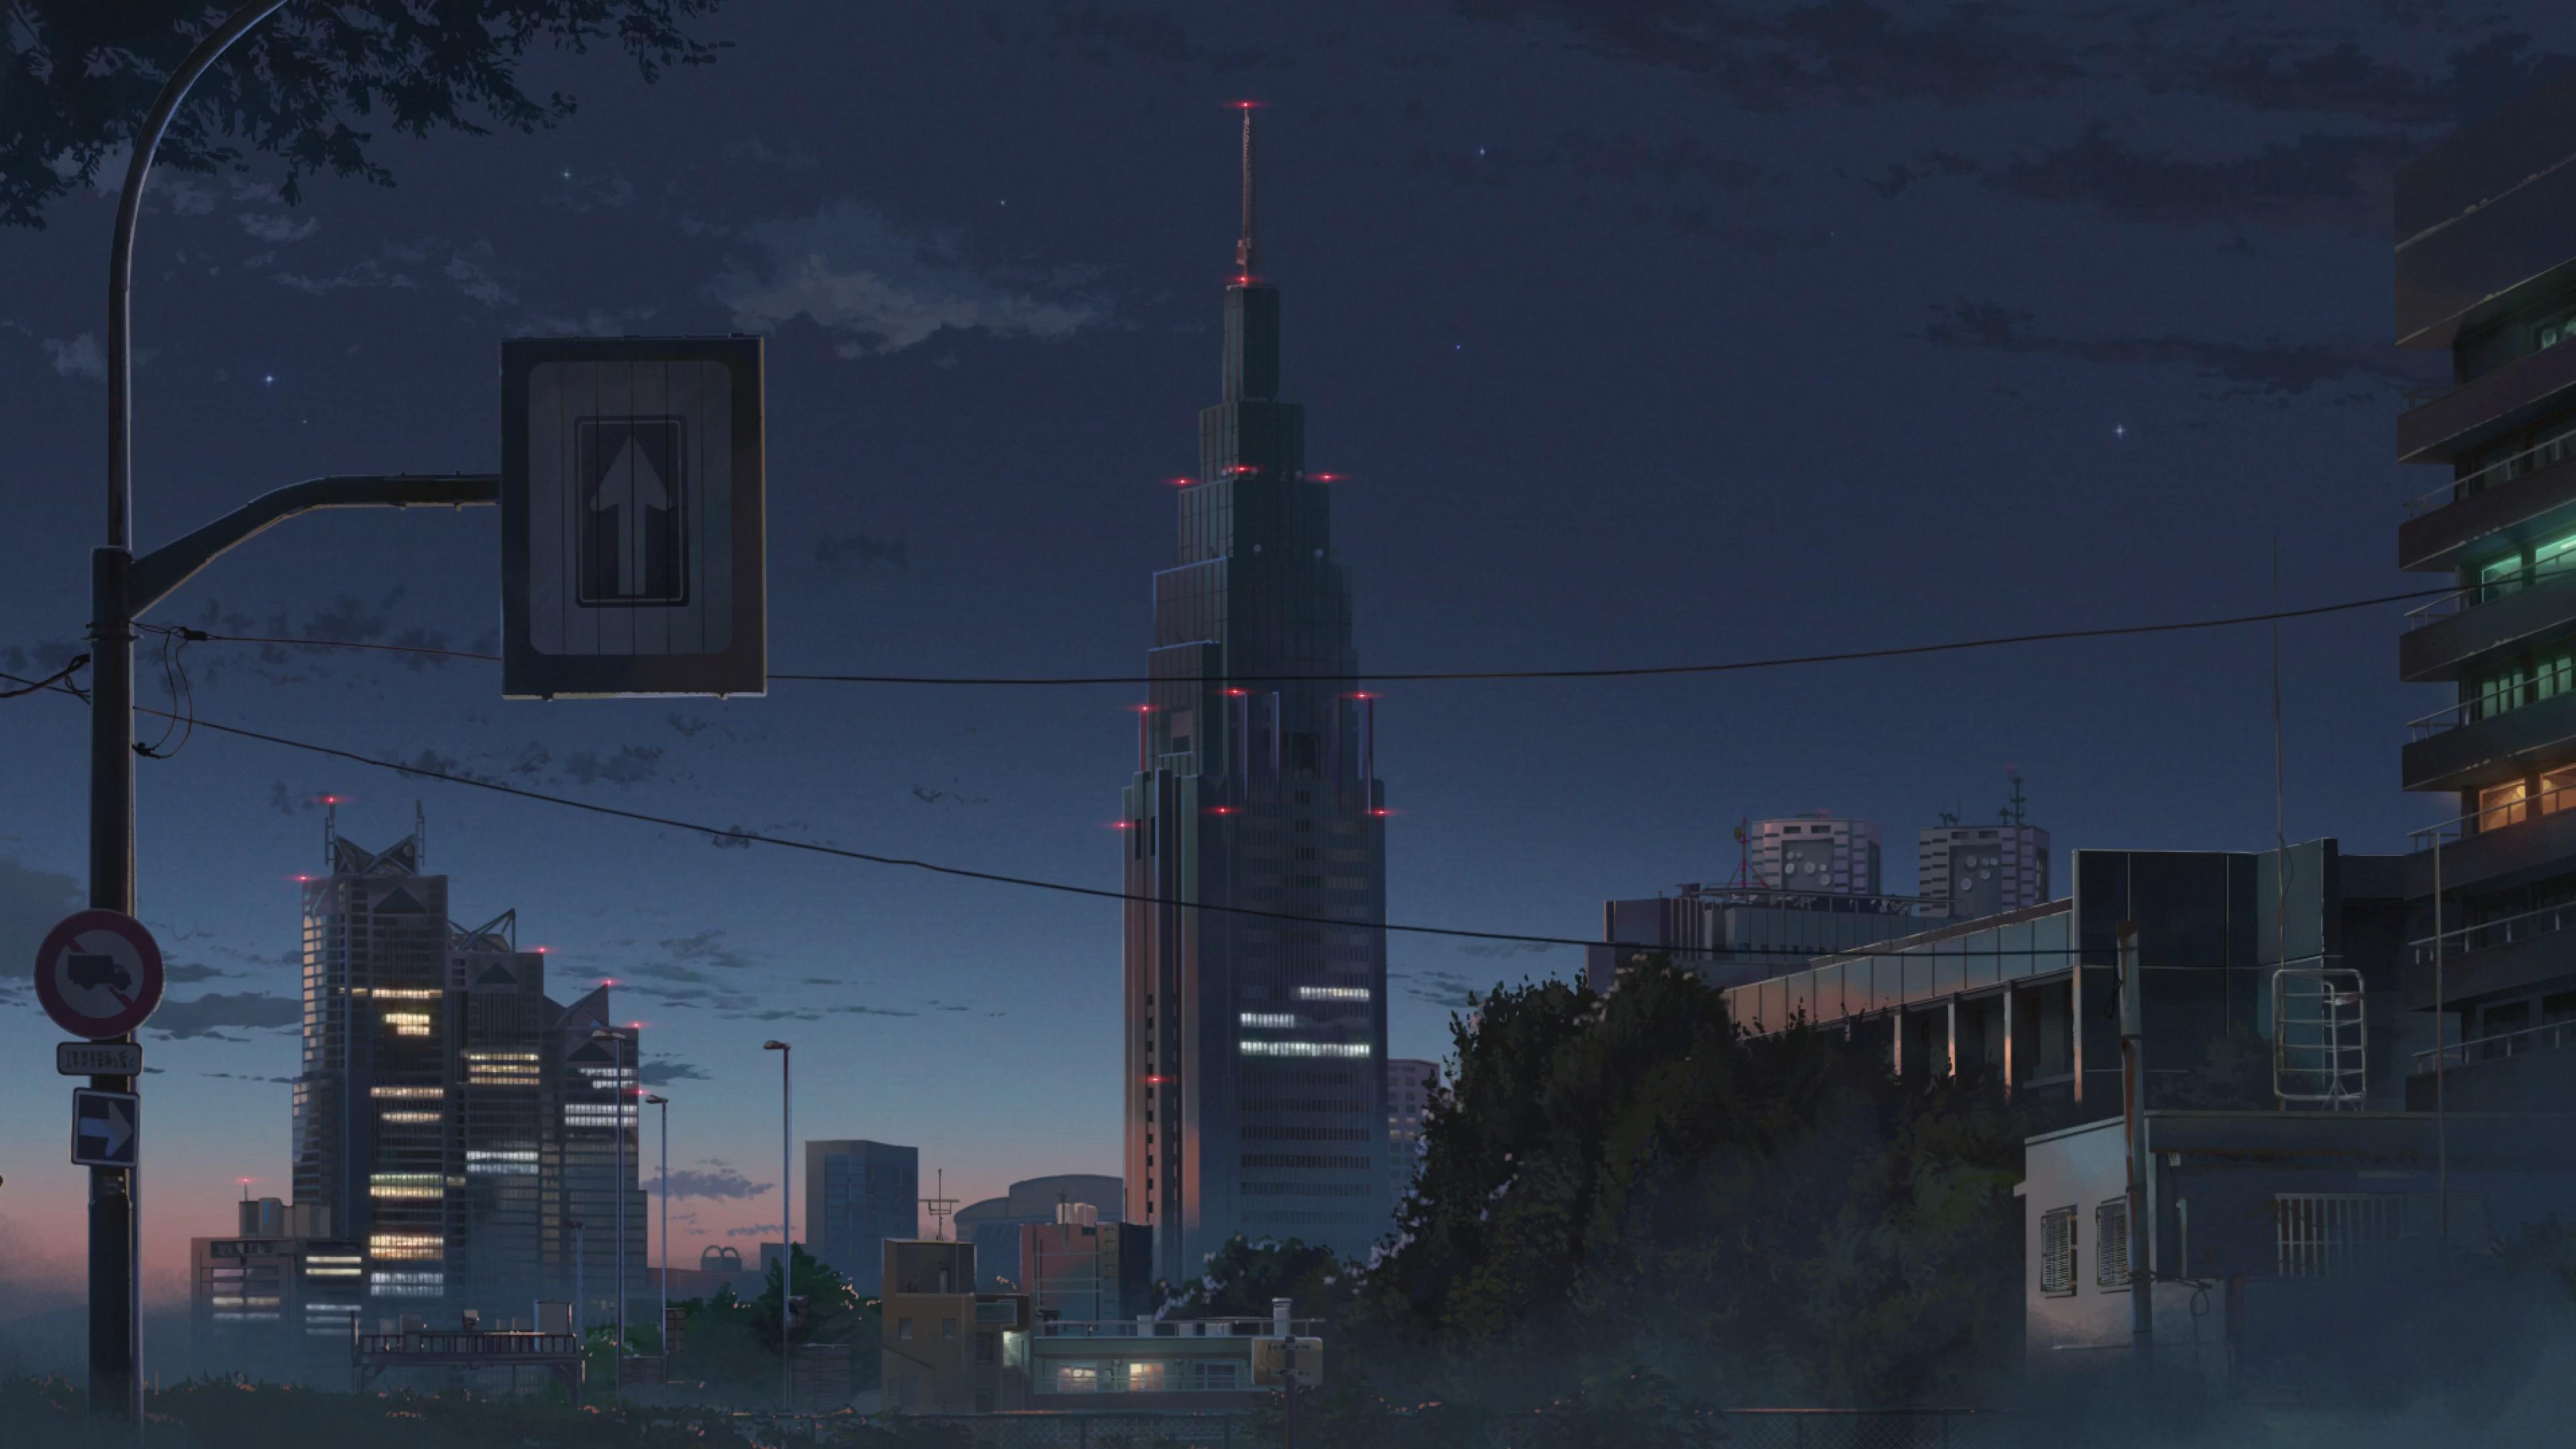 3840x2160 Kimi No Na Wa Anime City 4k Wallpaper Hd Anime 4k